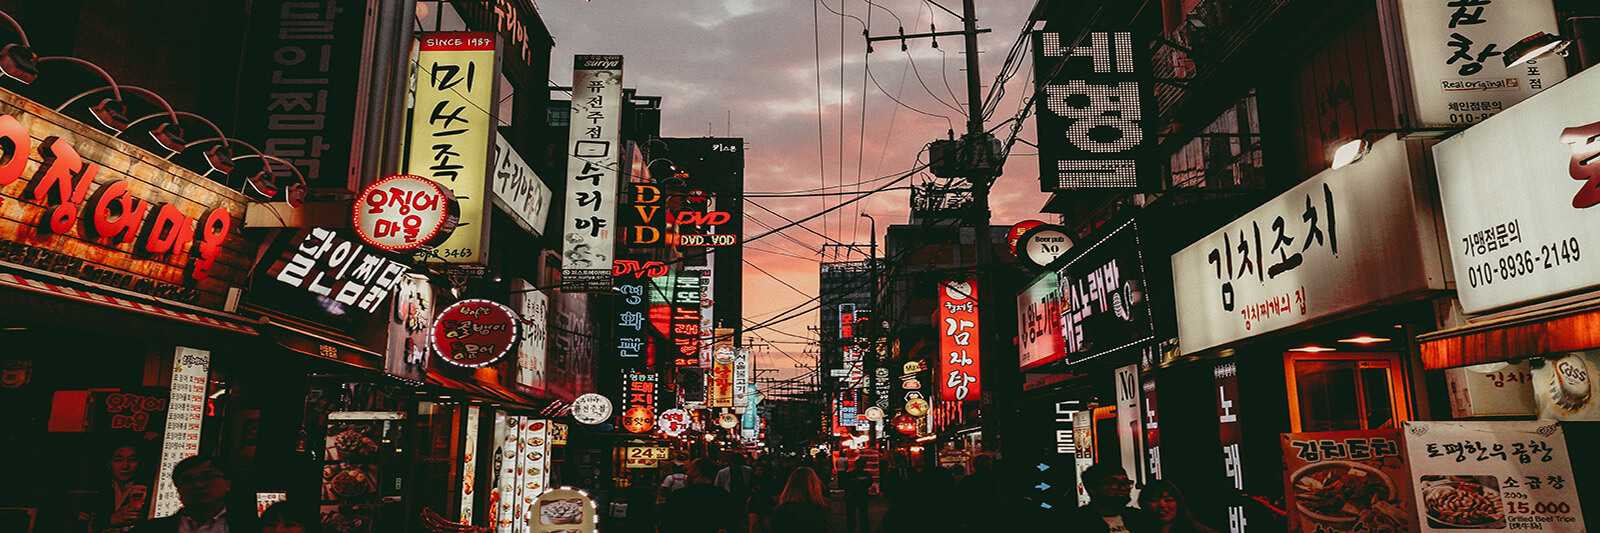 Streets of South Korea